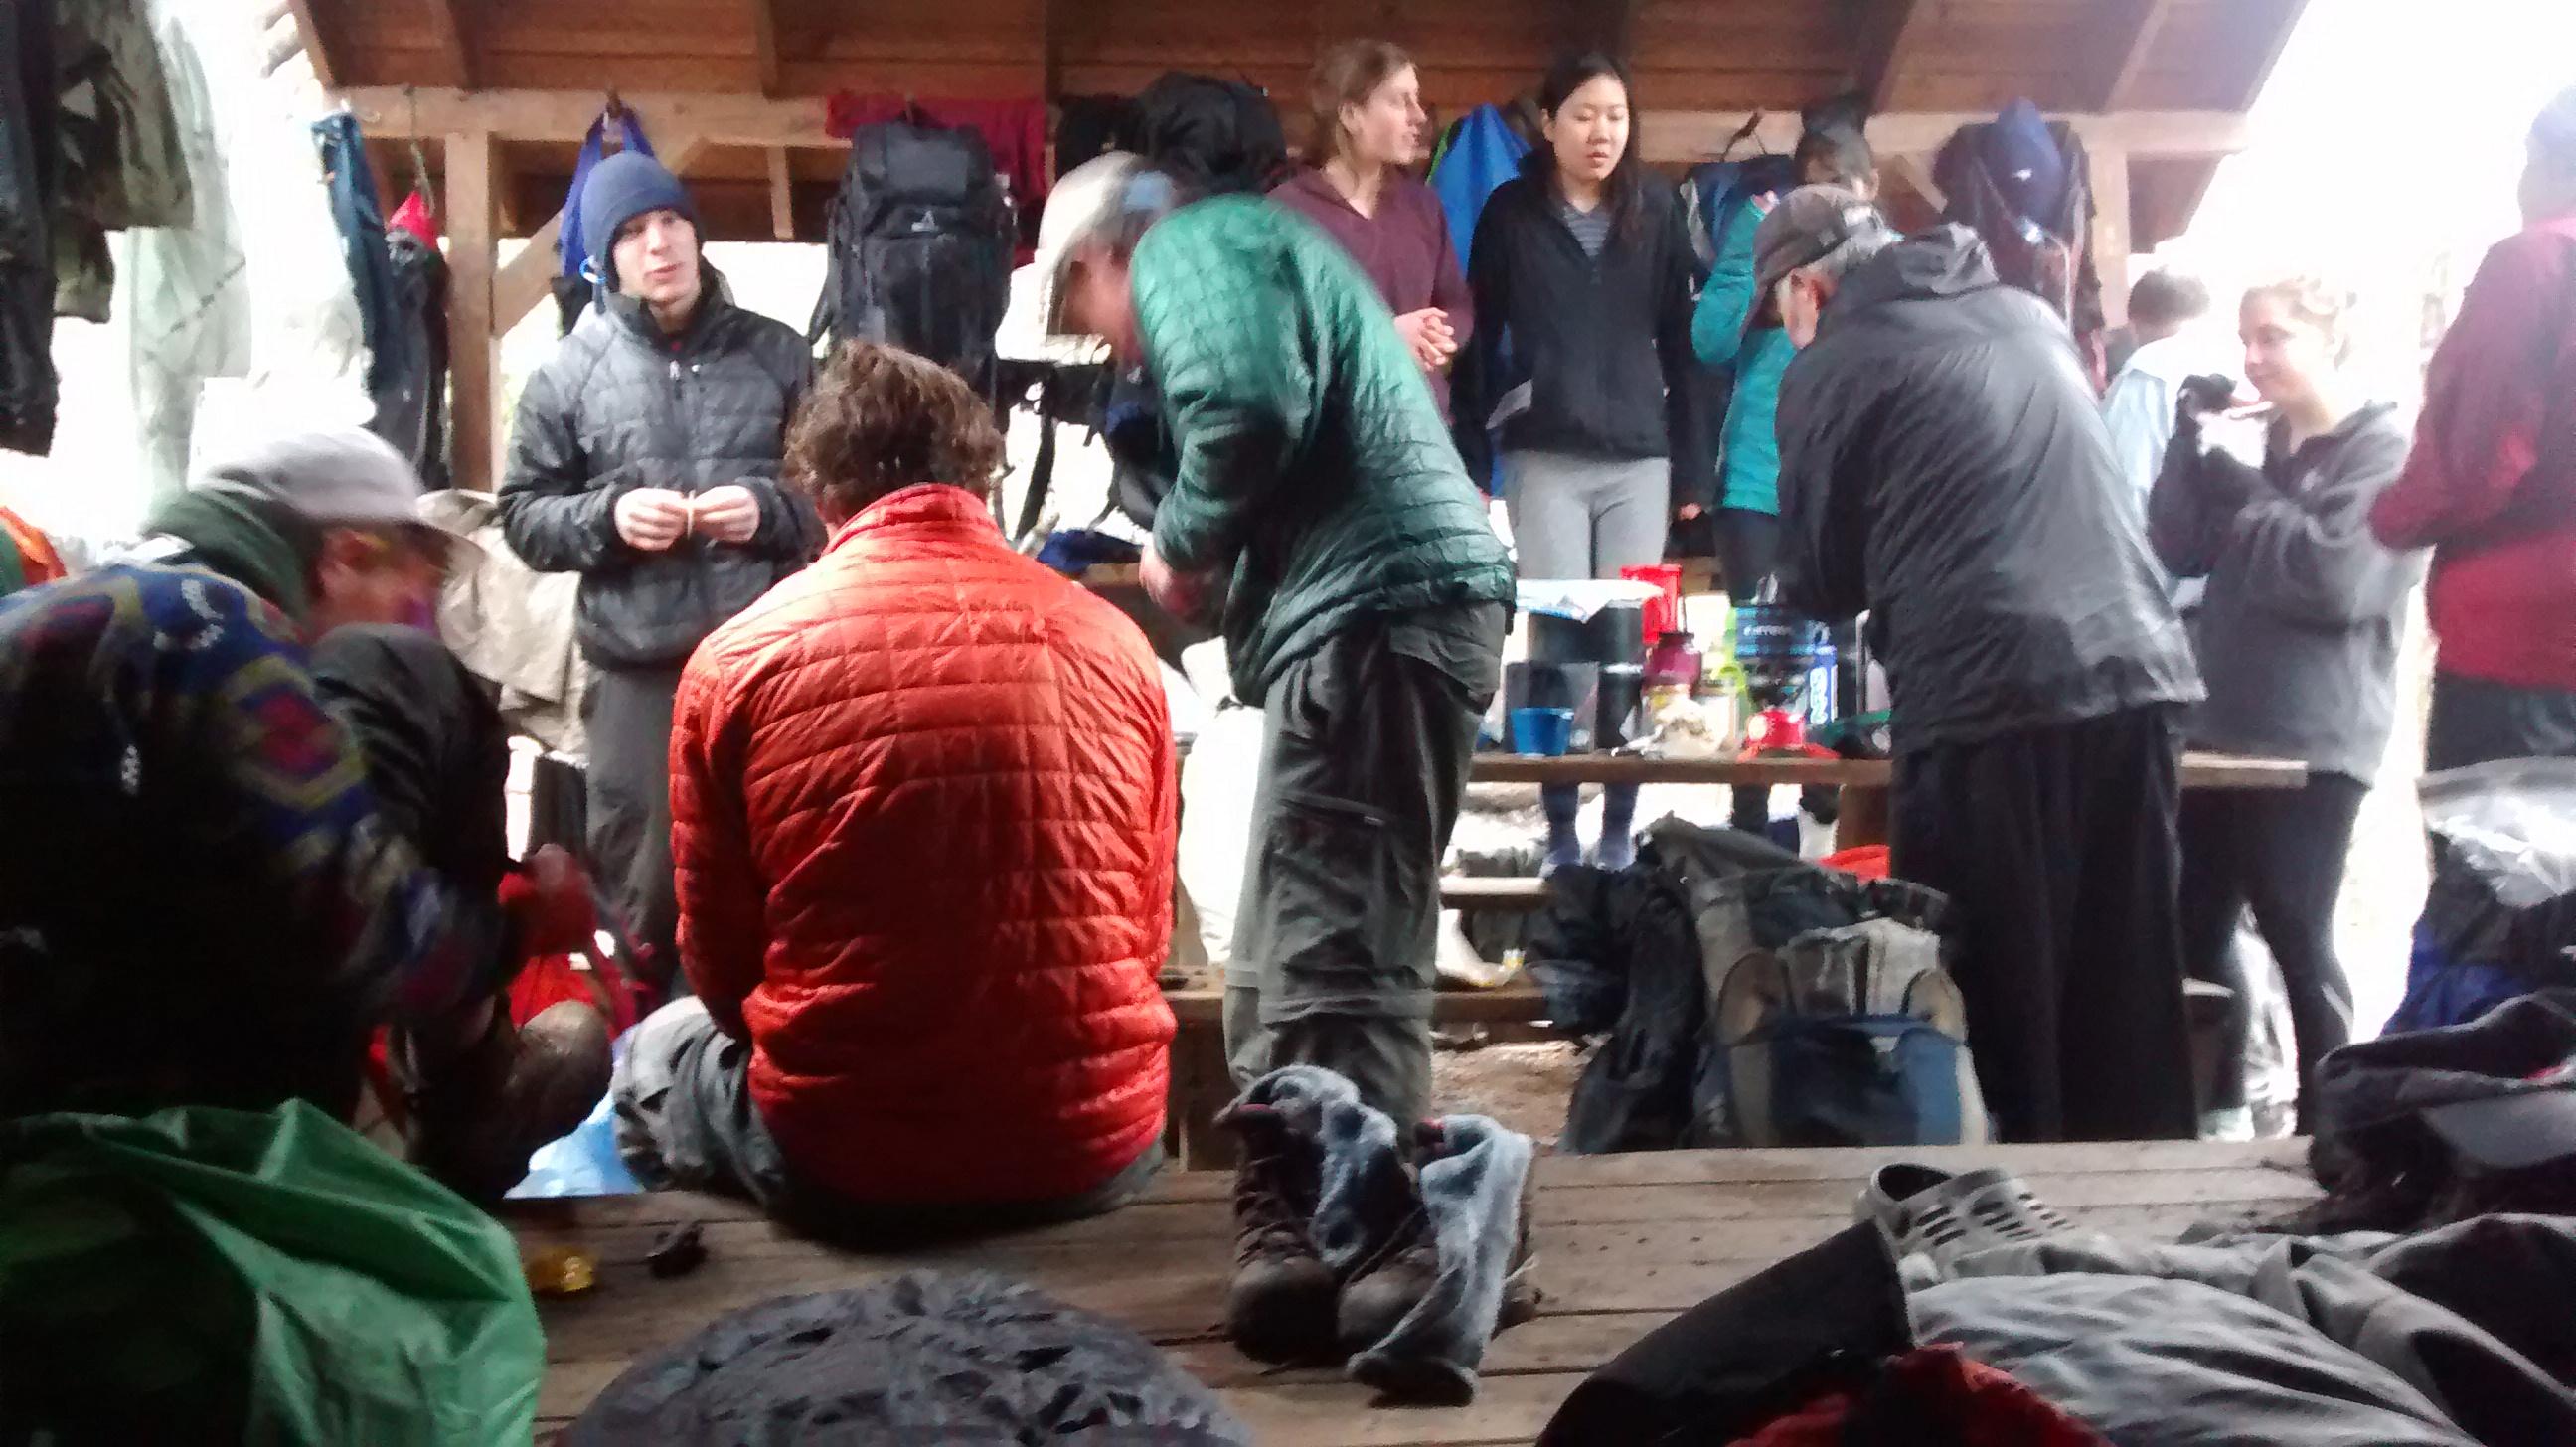 Day 3: Hawk Mountain to Gooch Mountain